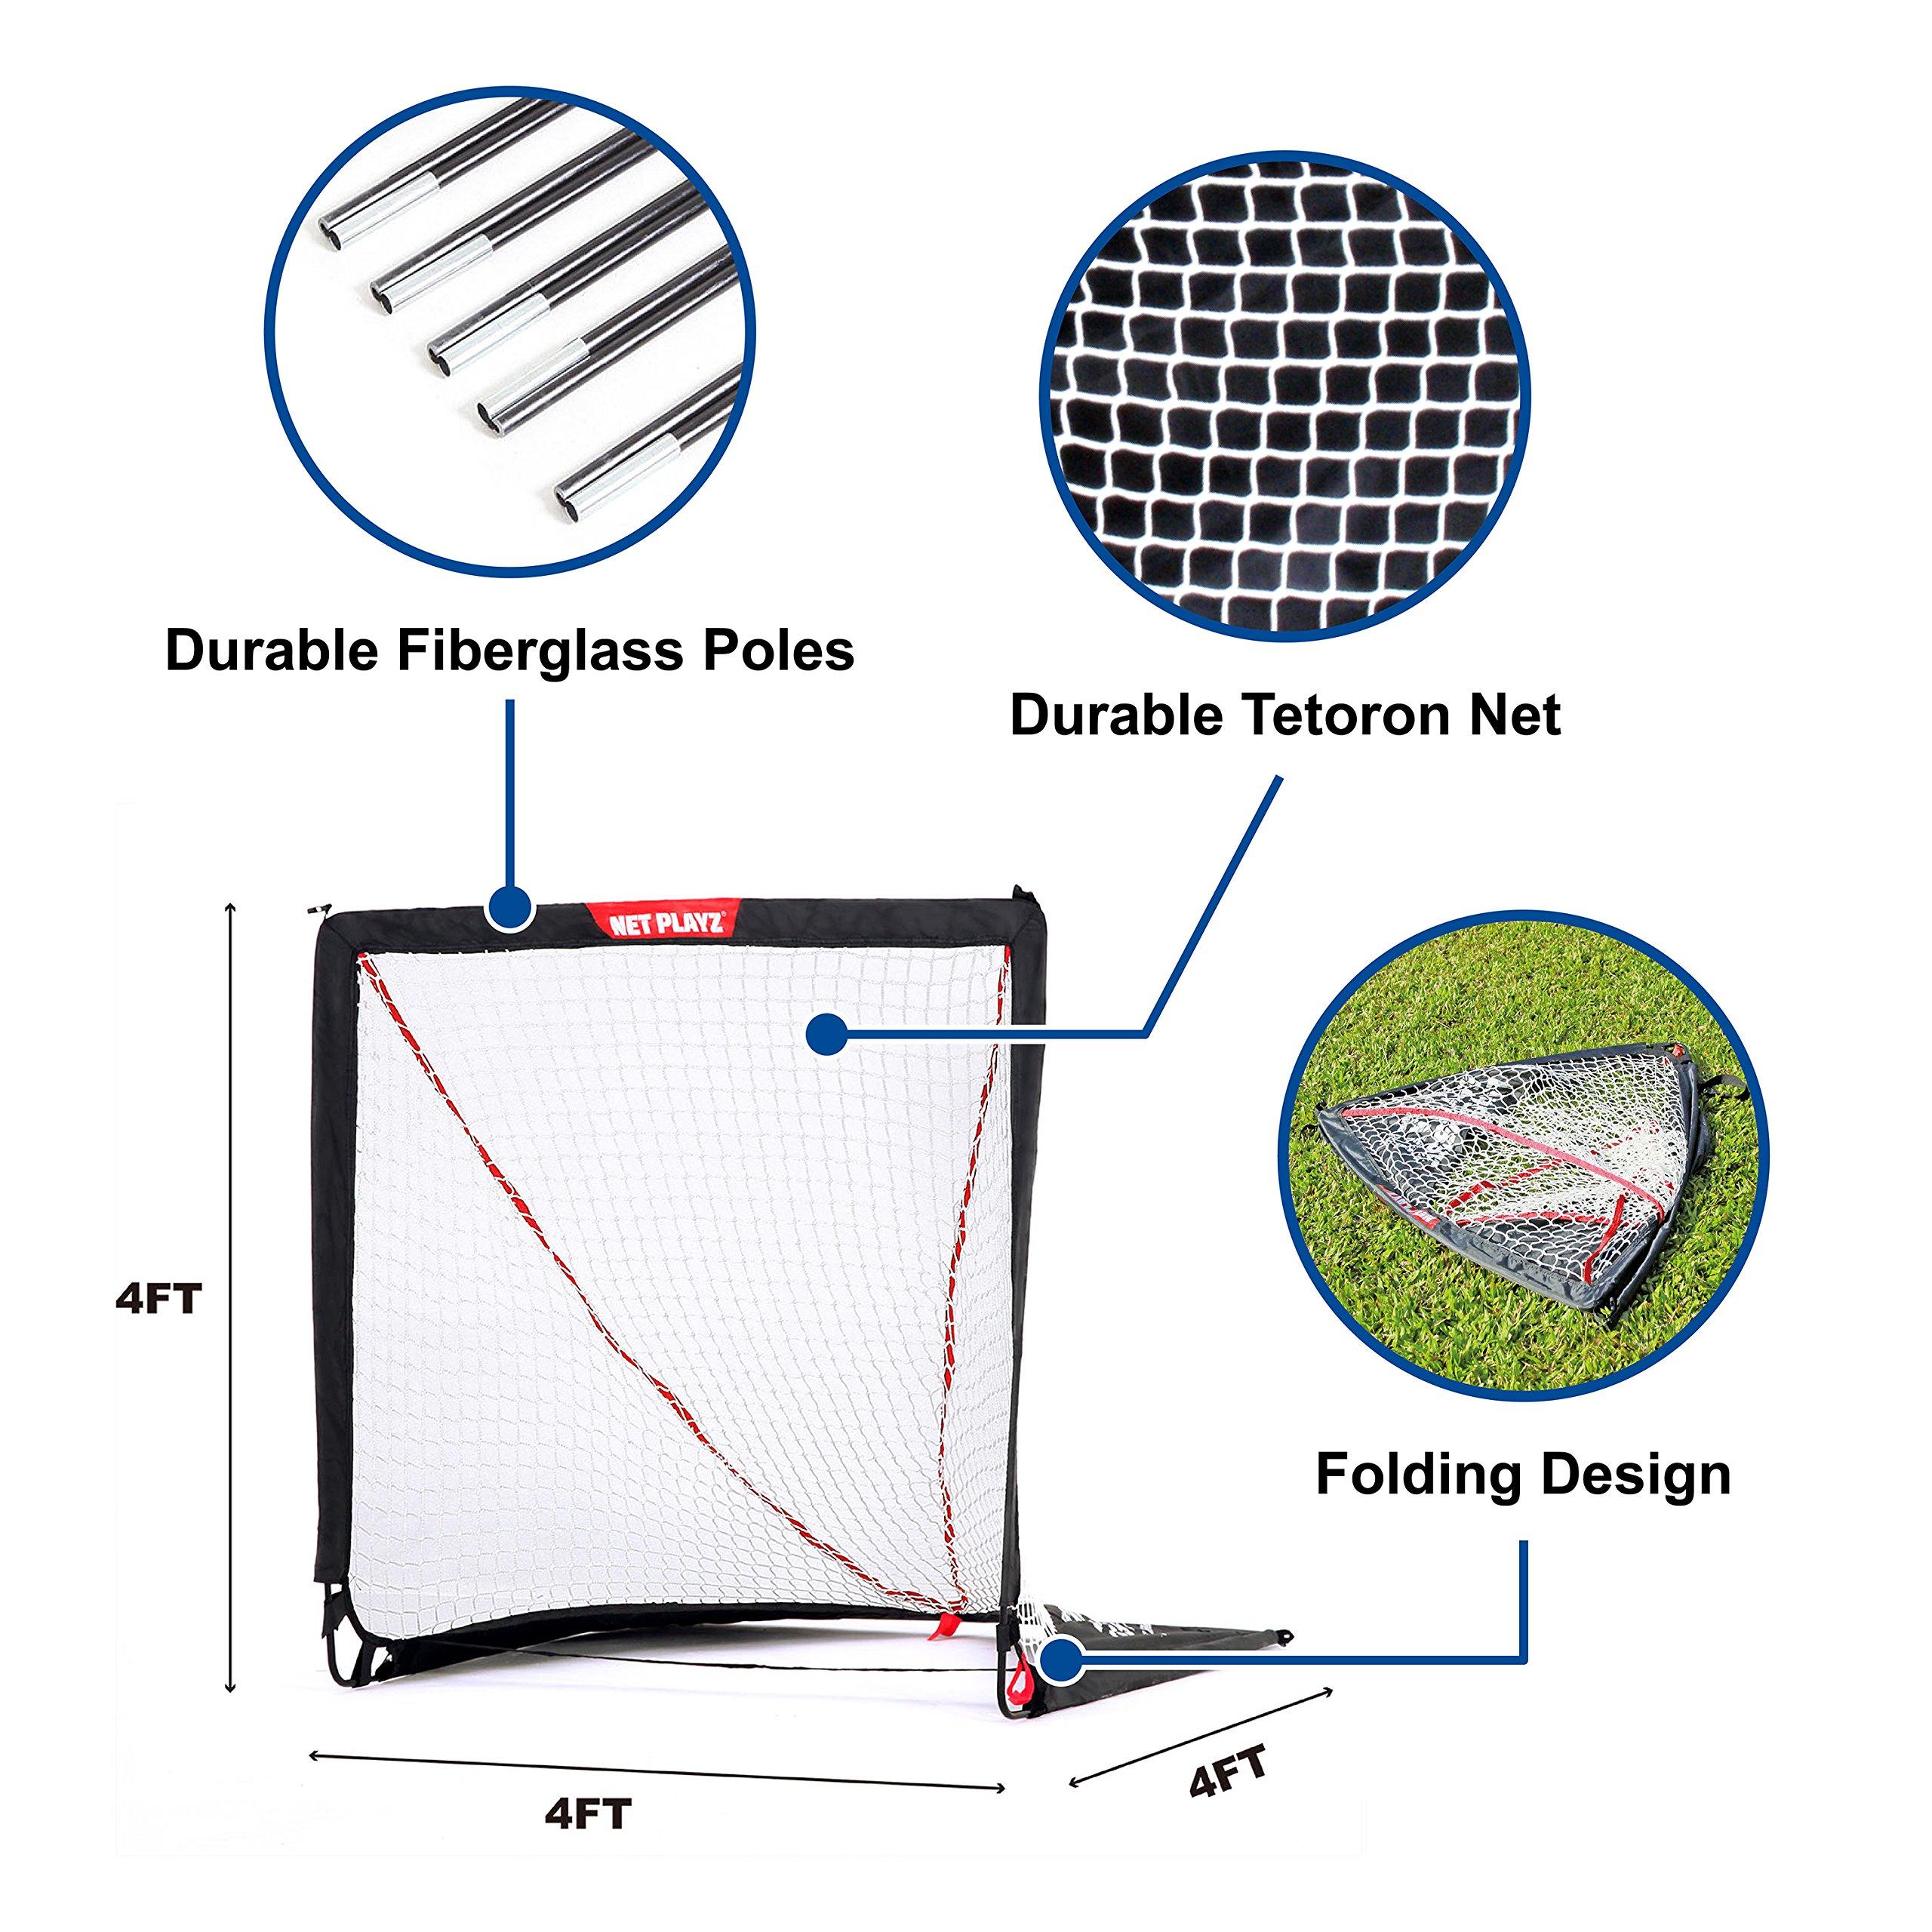 NET PLAYZ 4 x 4 x 4 Feet Lacrosse Goal Fast Install, Fiberglass Frme, Lightweight, Foldable, Portable, Carry bag Included by NET PLAYZ (Image #2)